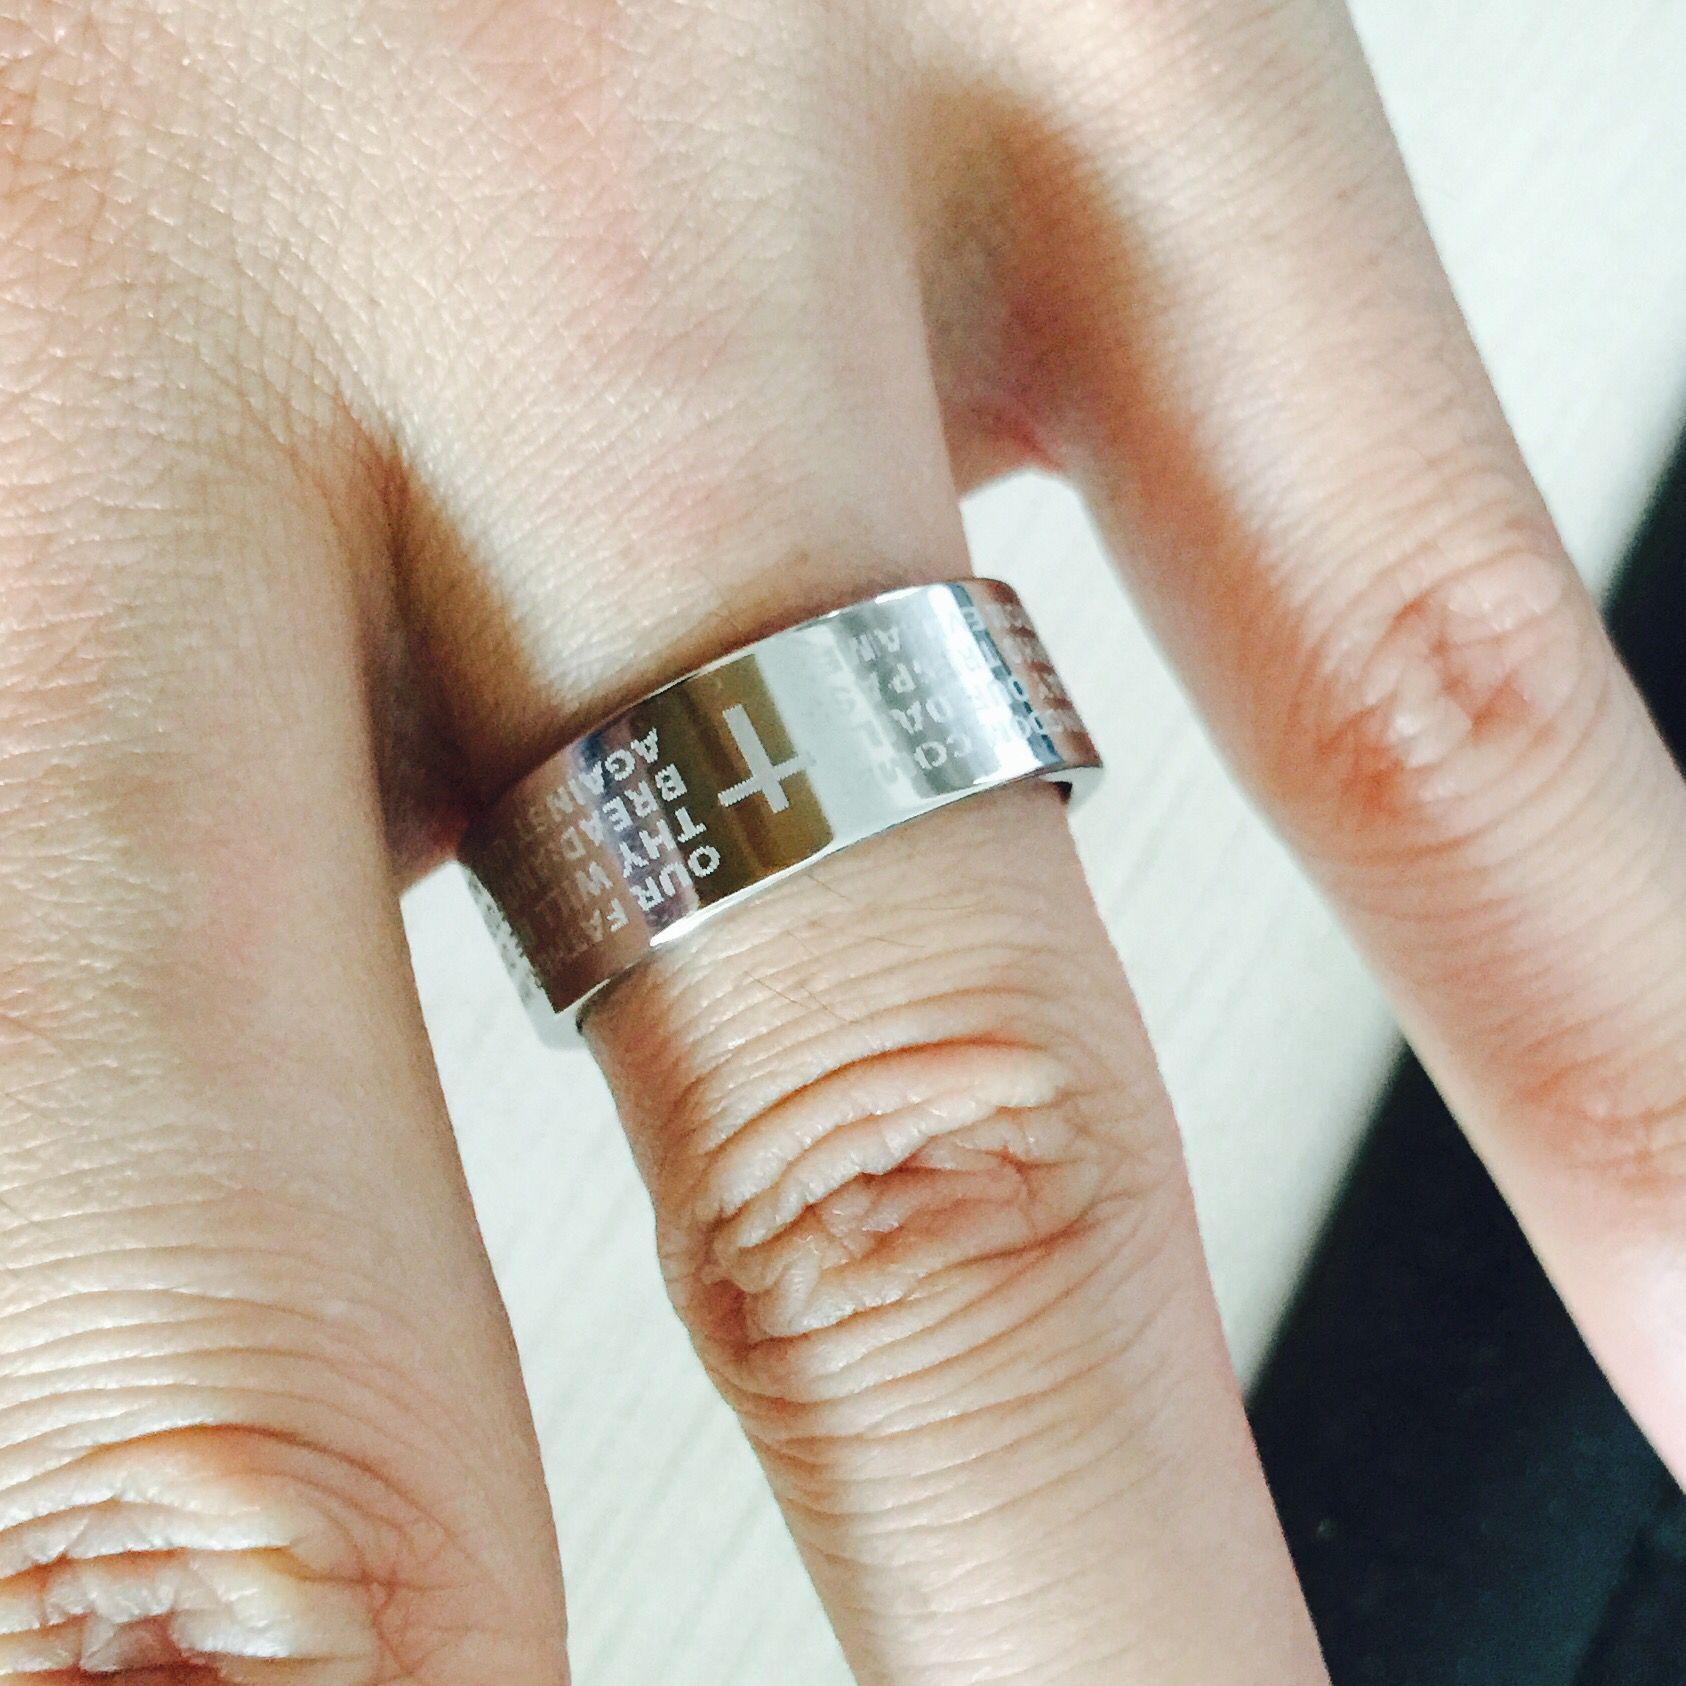 Silver english bible ring 8mm 316 Titanium Steel 18k white gold plated cross Letter prayer bible wedding band ring men women